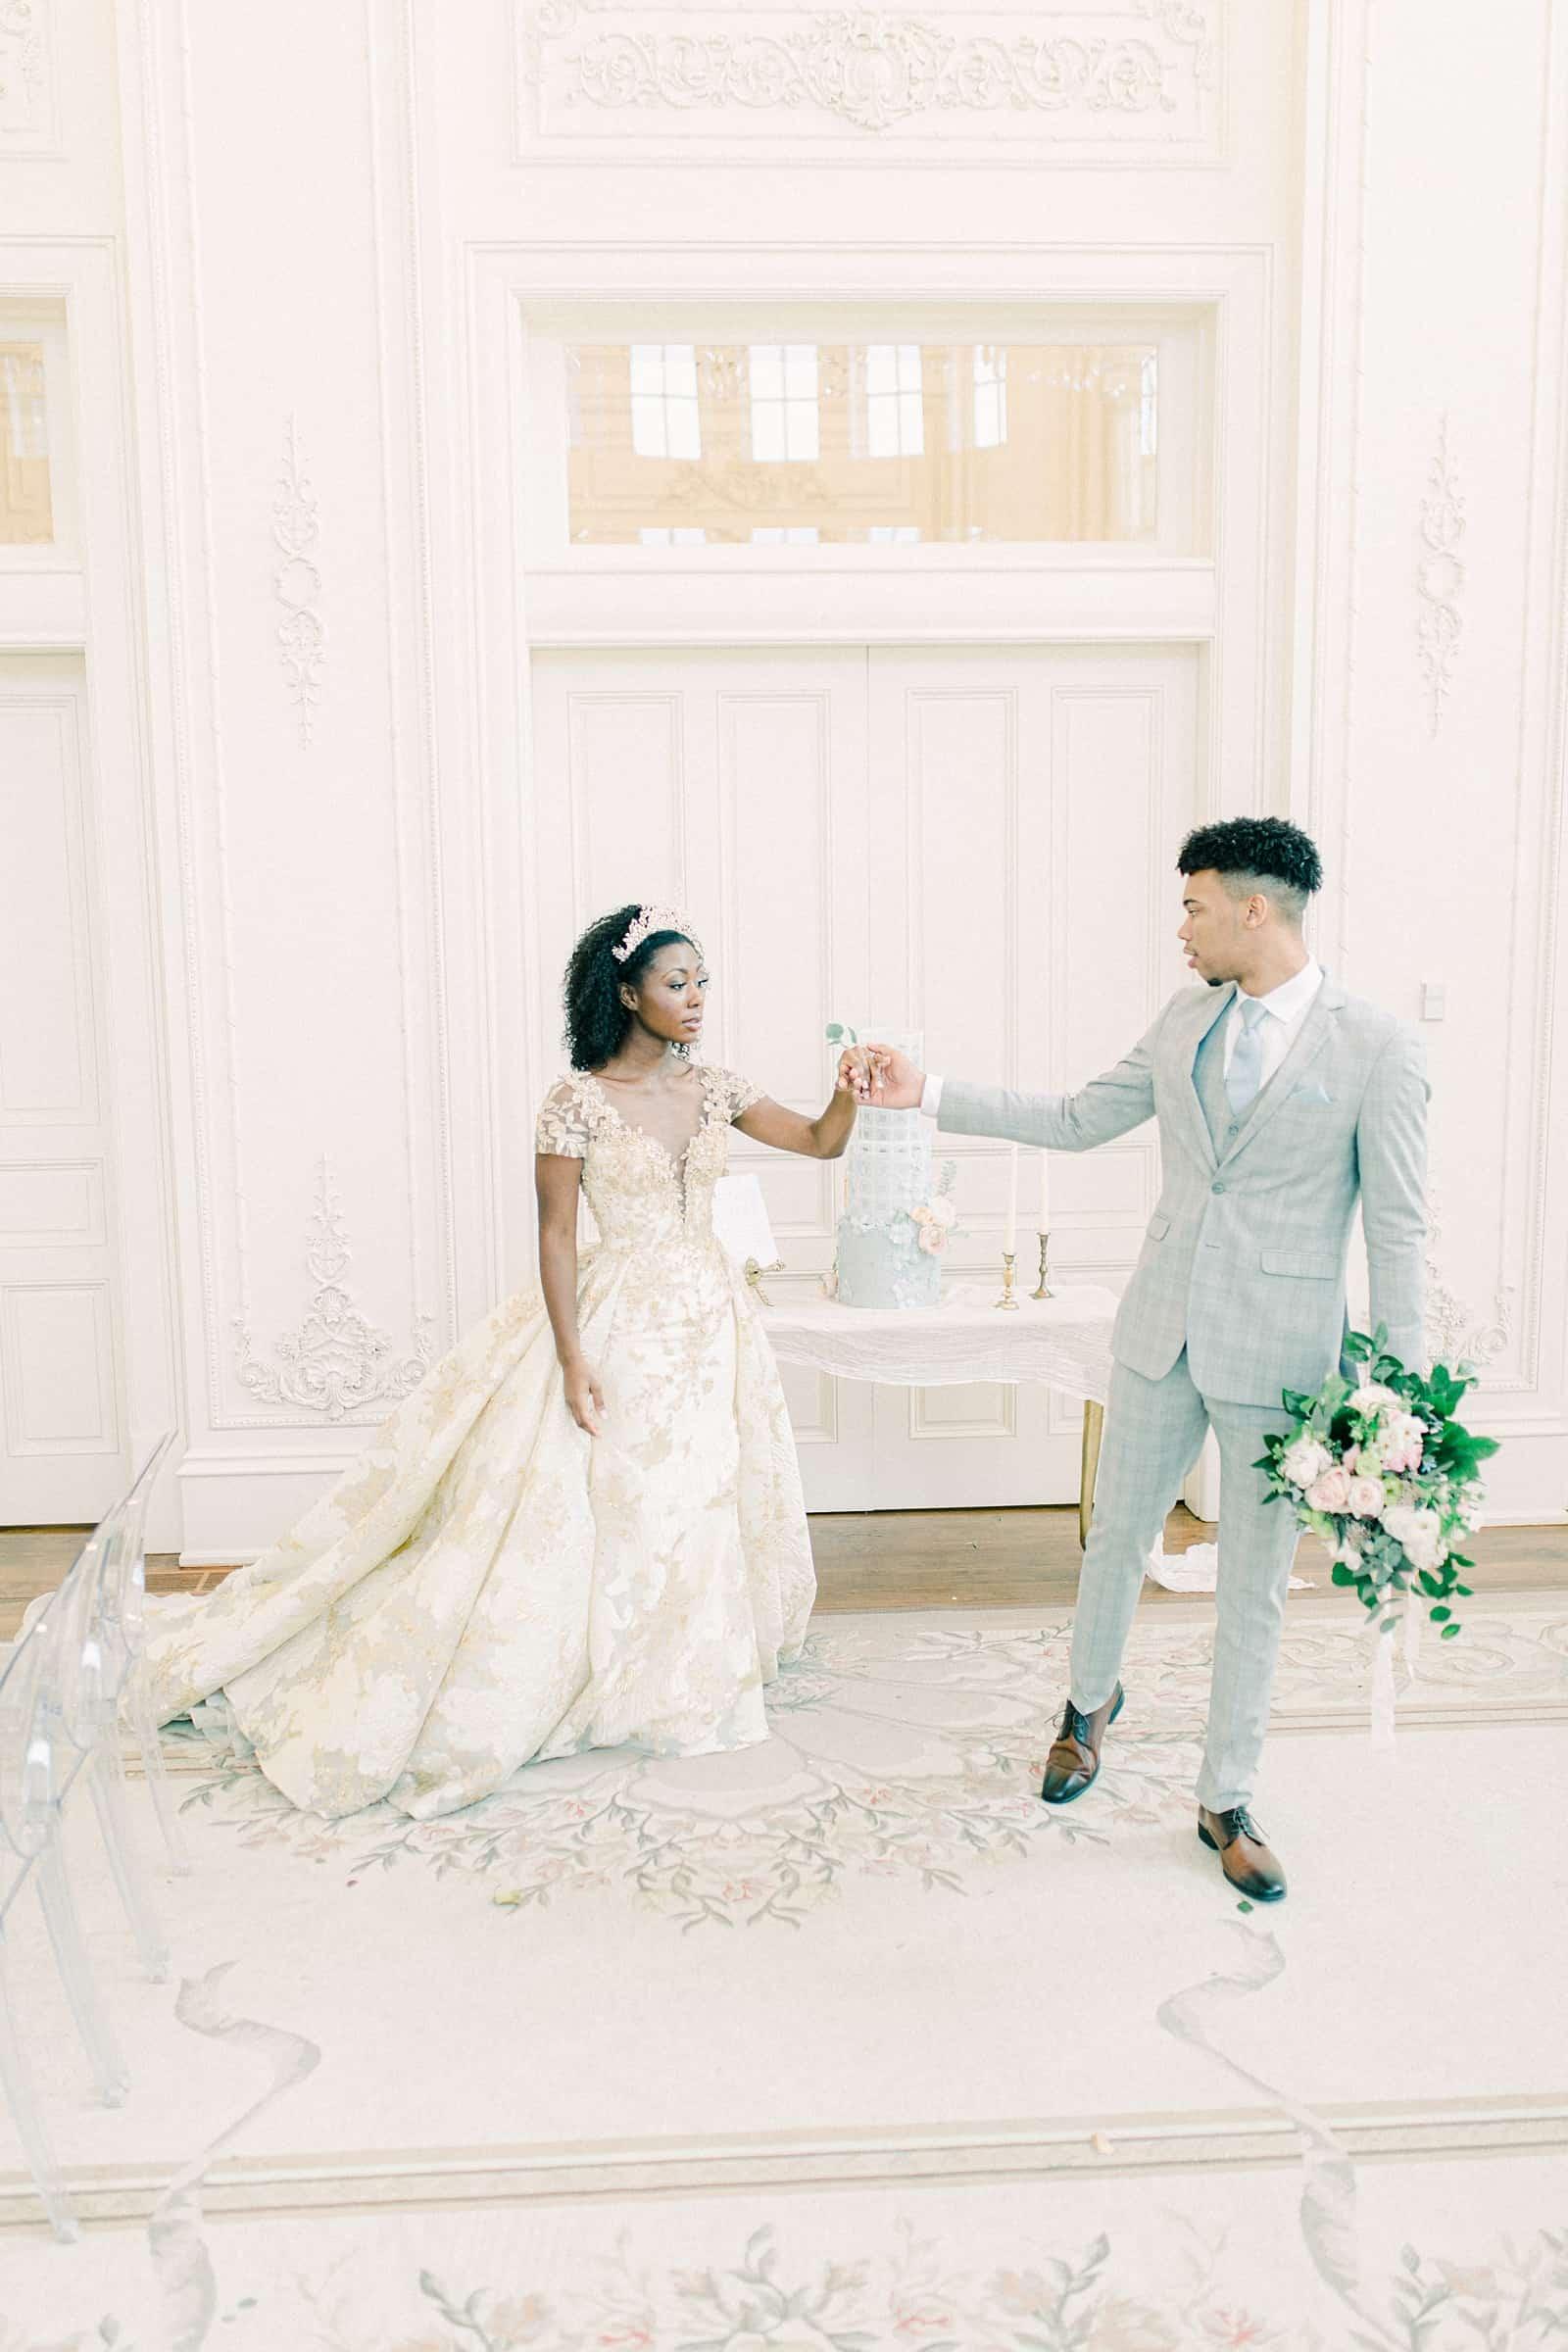 Fairytale bride and groom in all white ballroom, elegant wedding